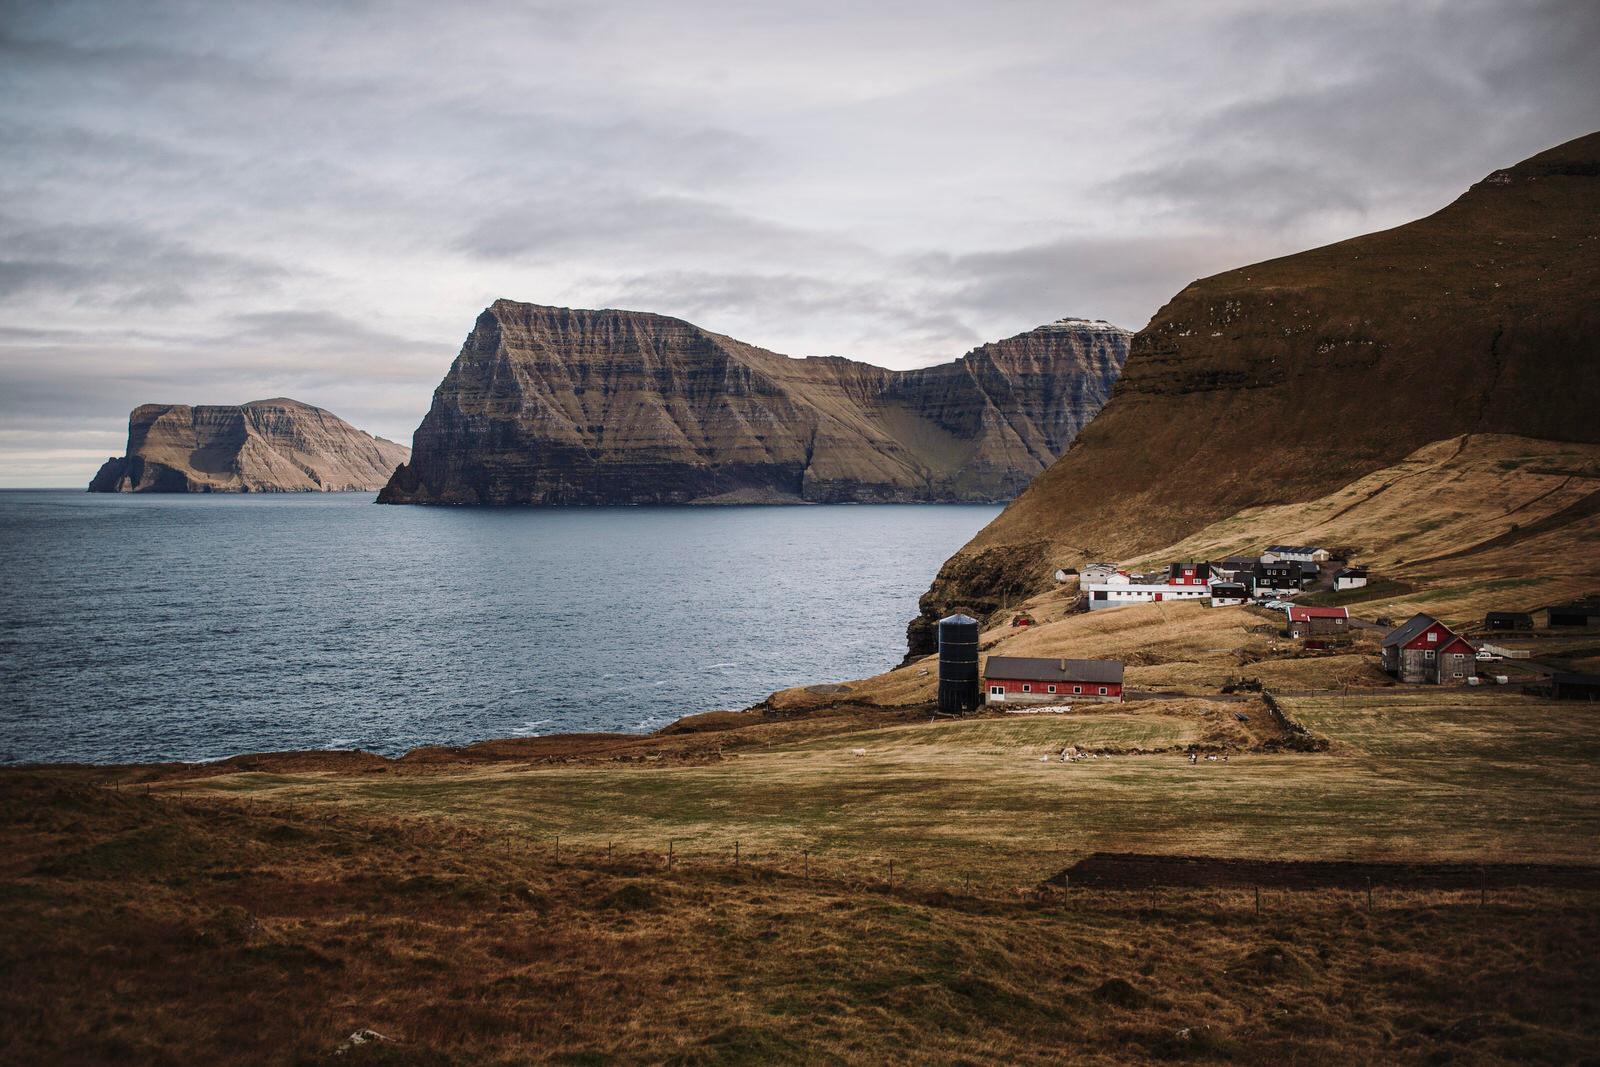 viaggio isole faroe_20.jpg